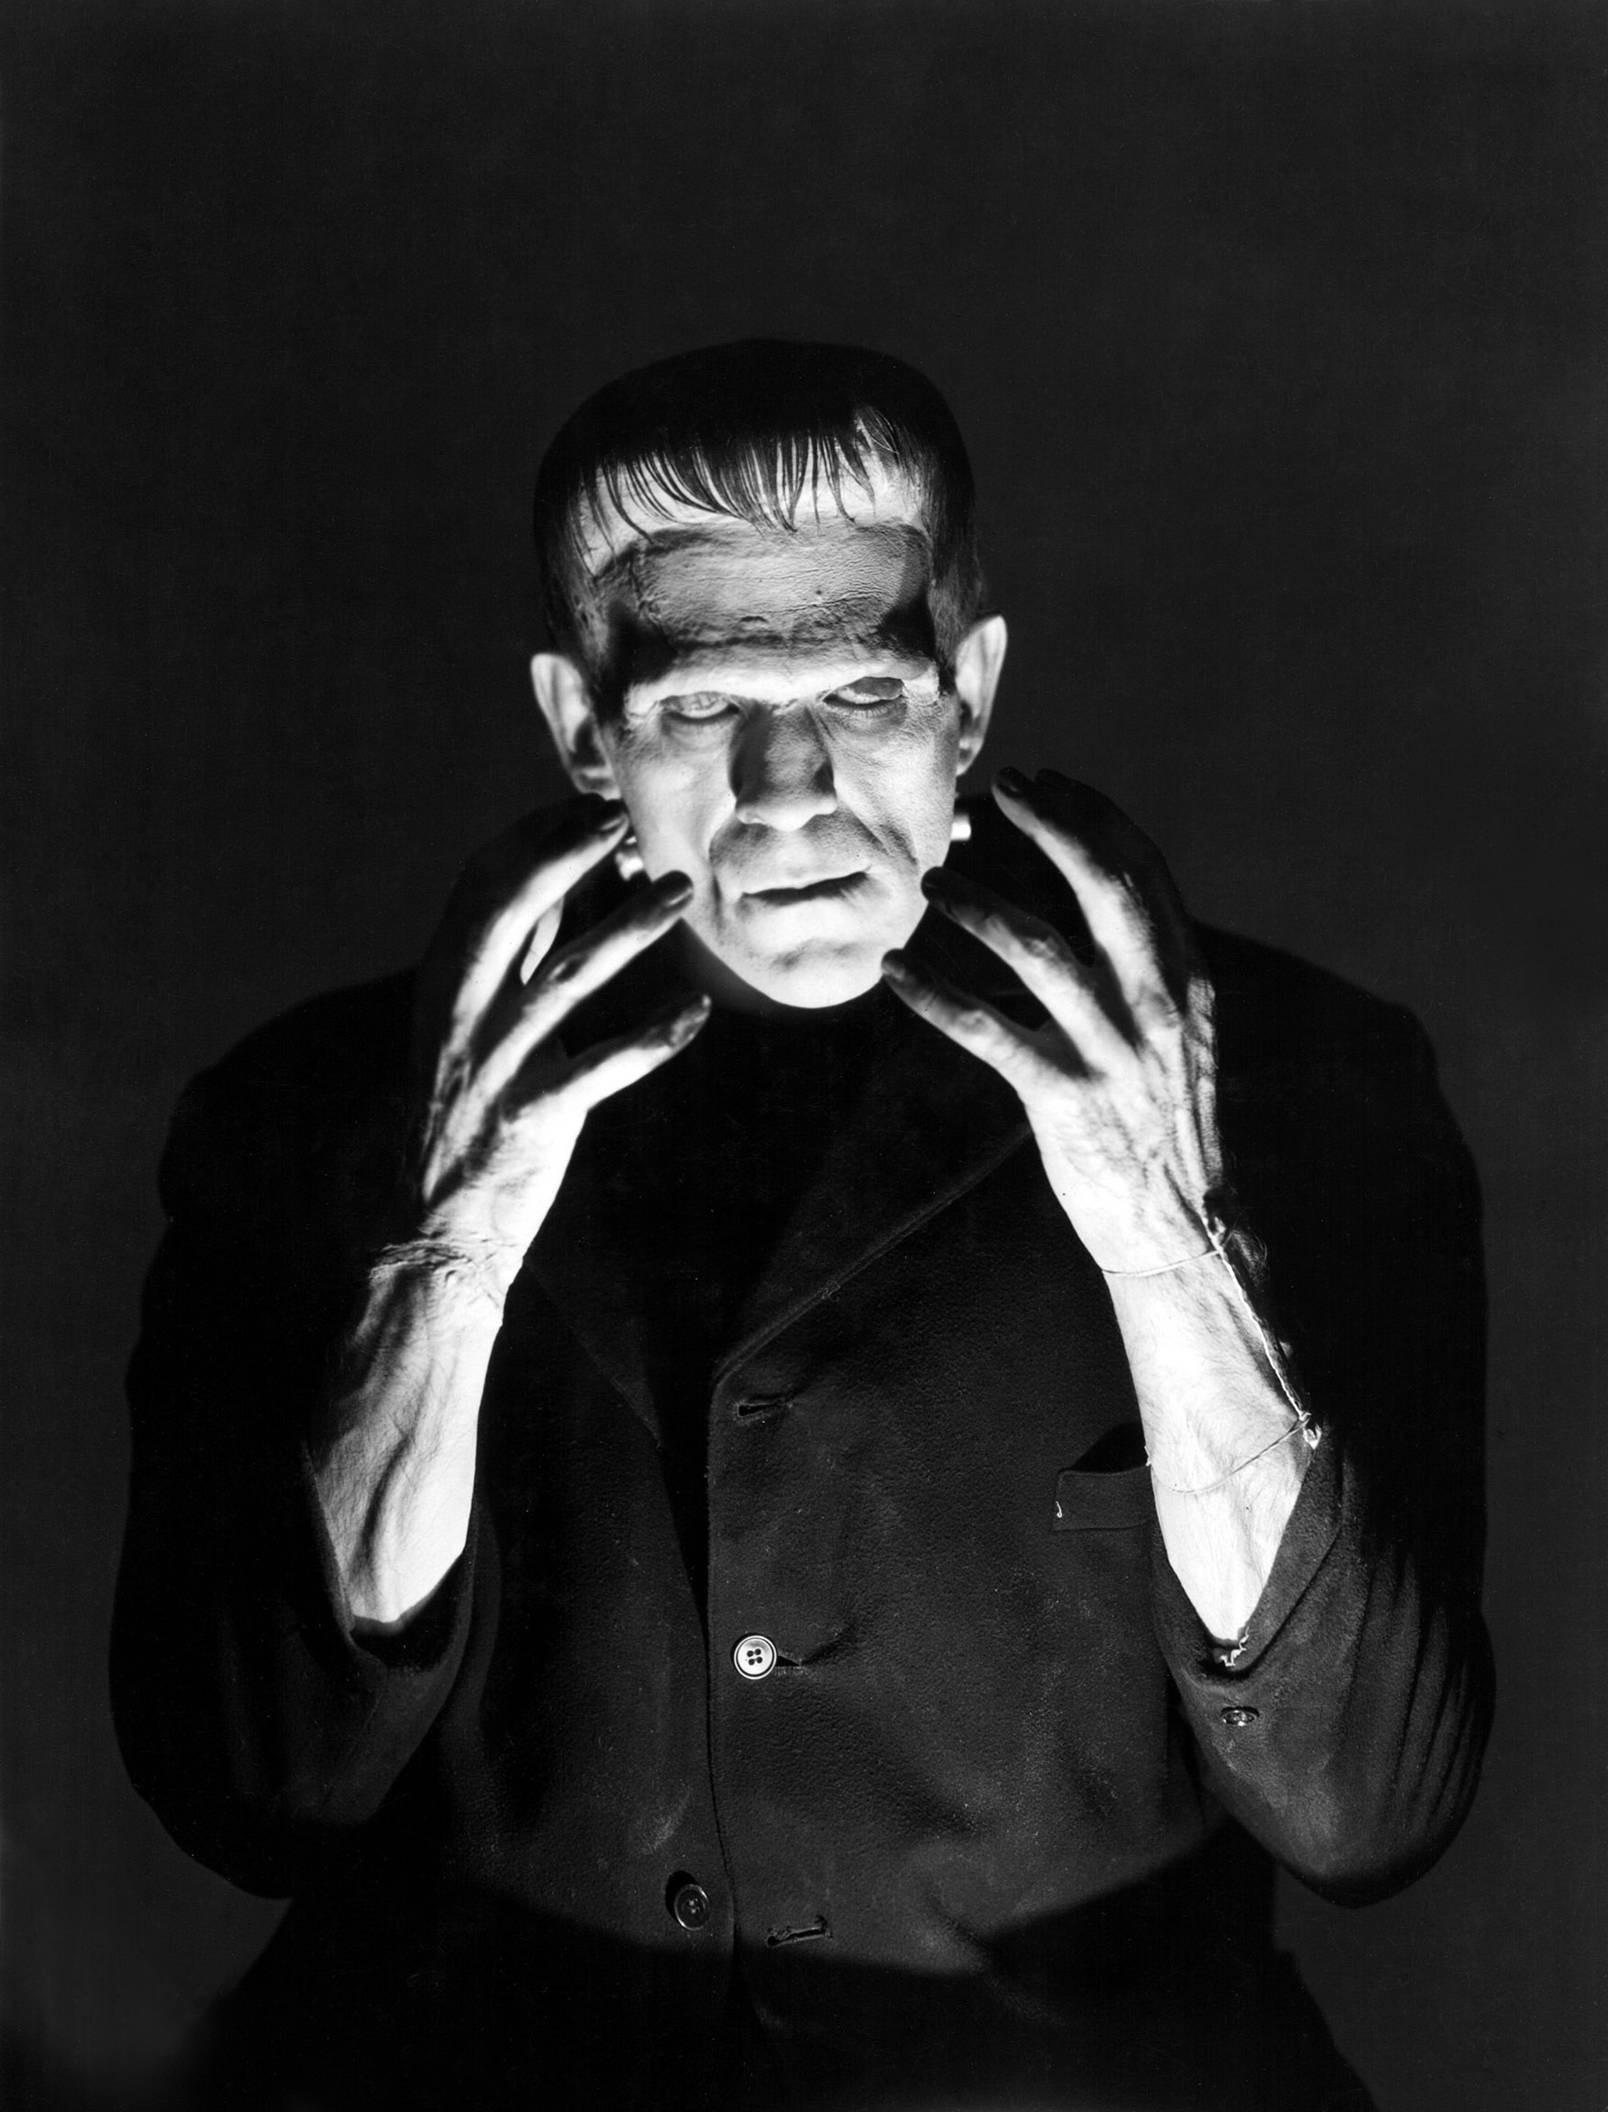 universal monsters wallpapers 1080 – photo #32. Frankenstein